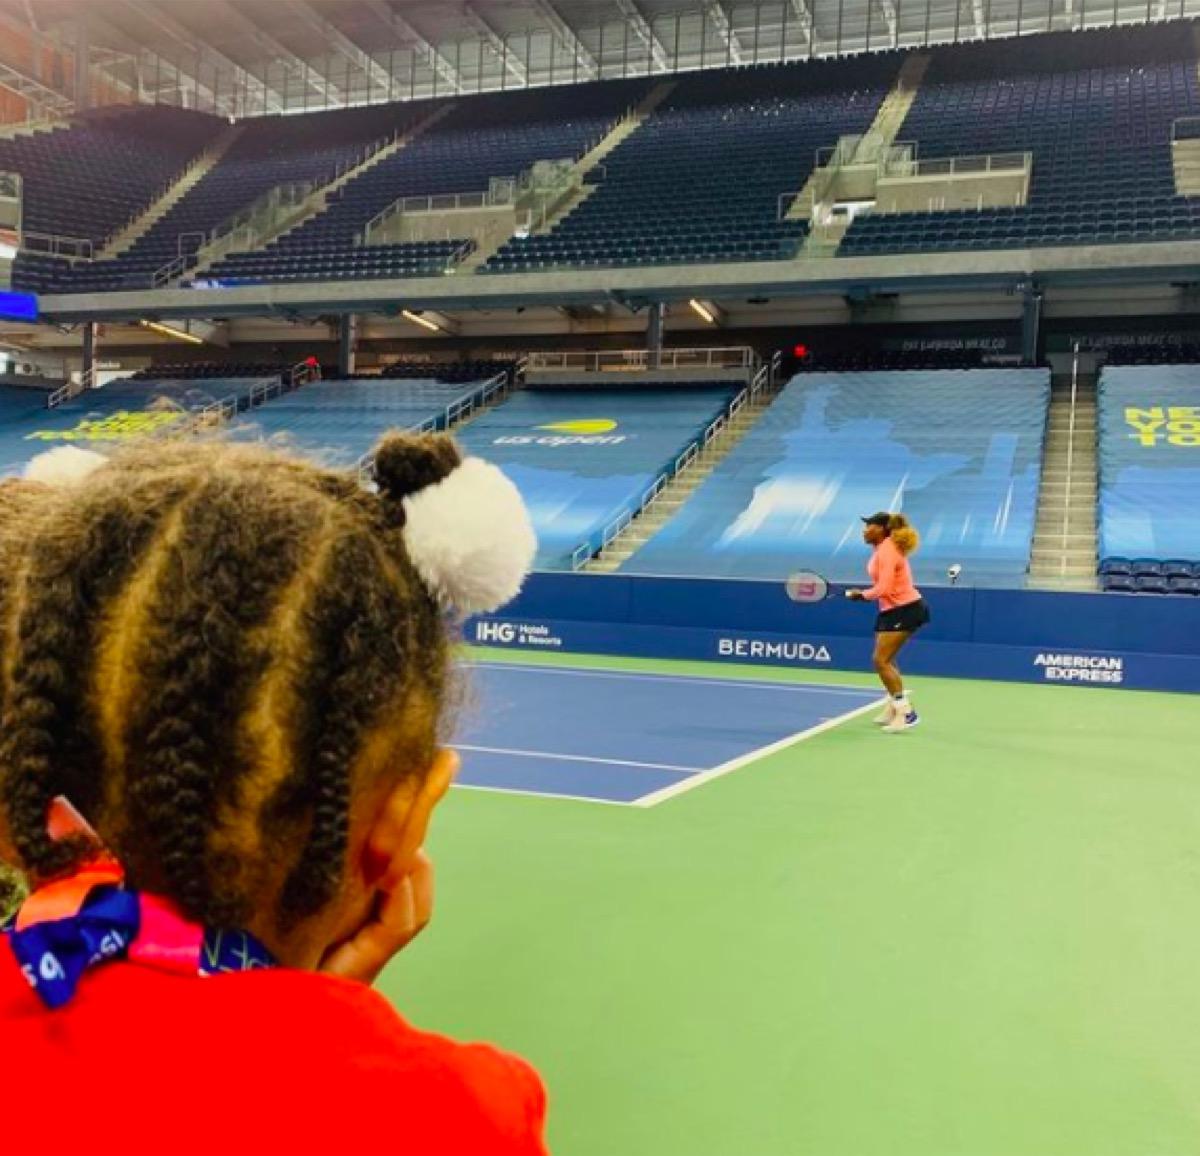 Serena Williams' daughter watching her play tennis